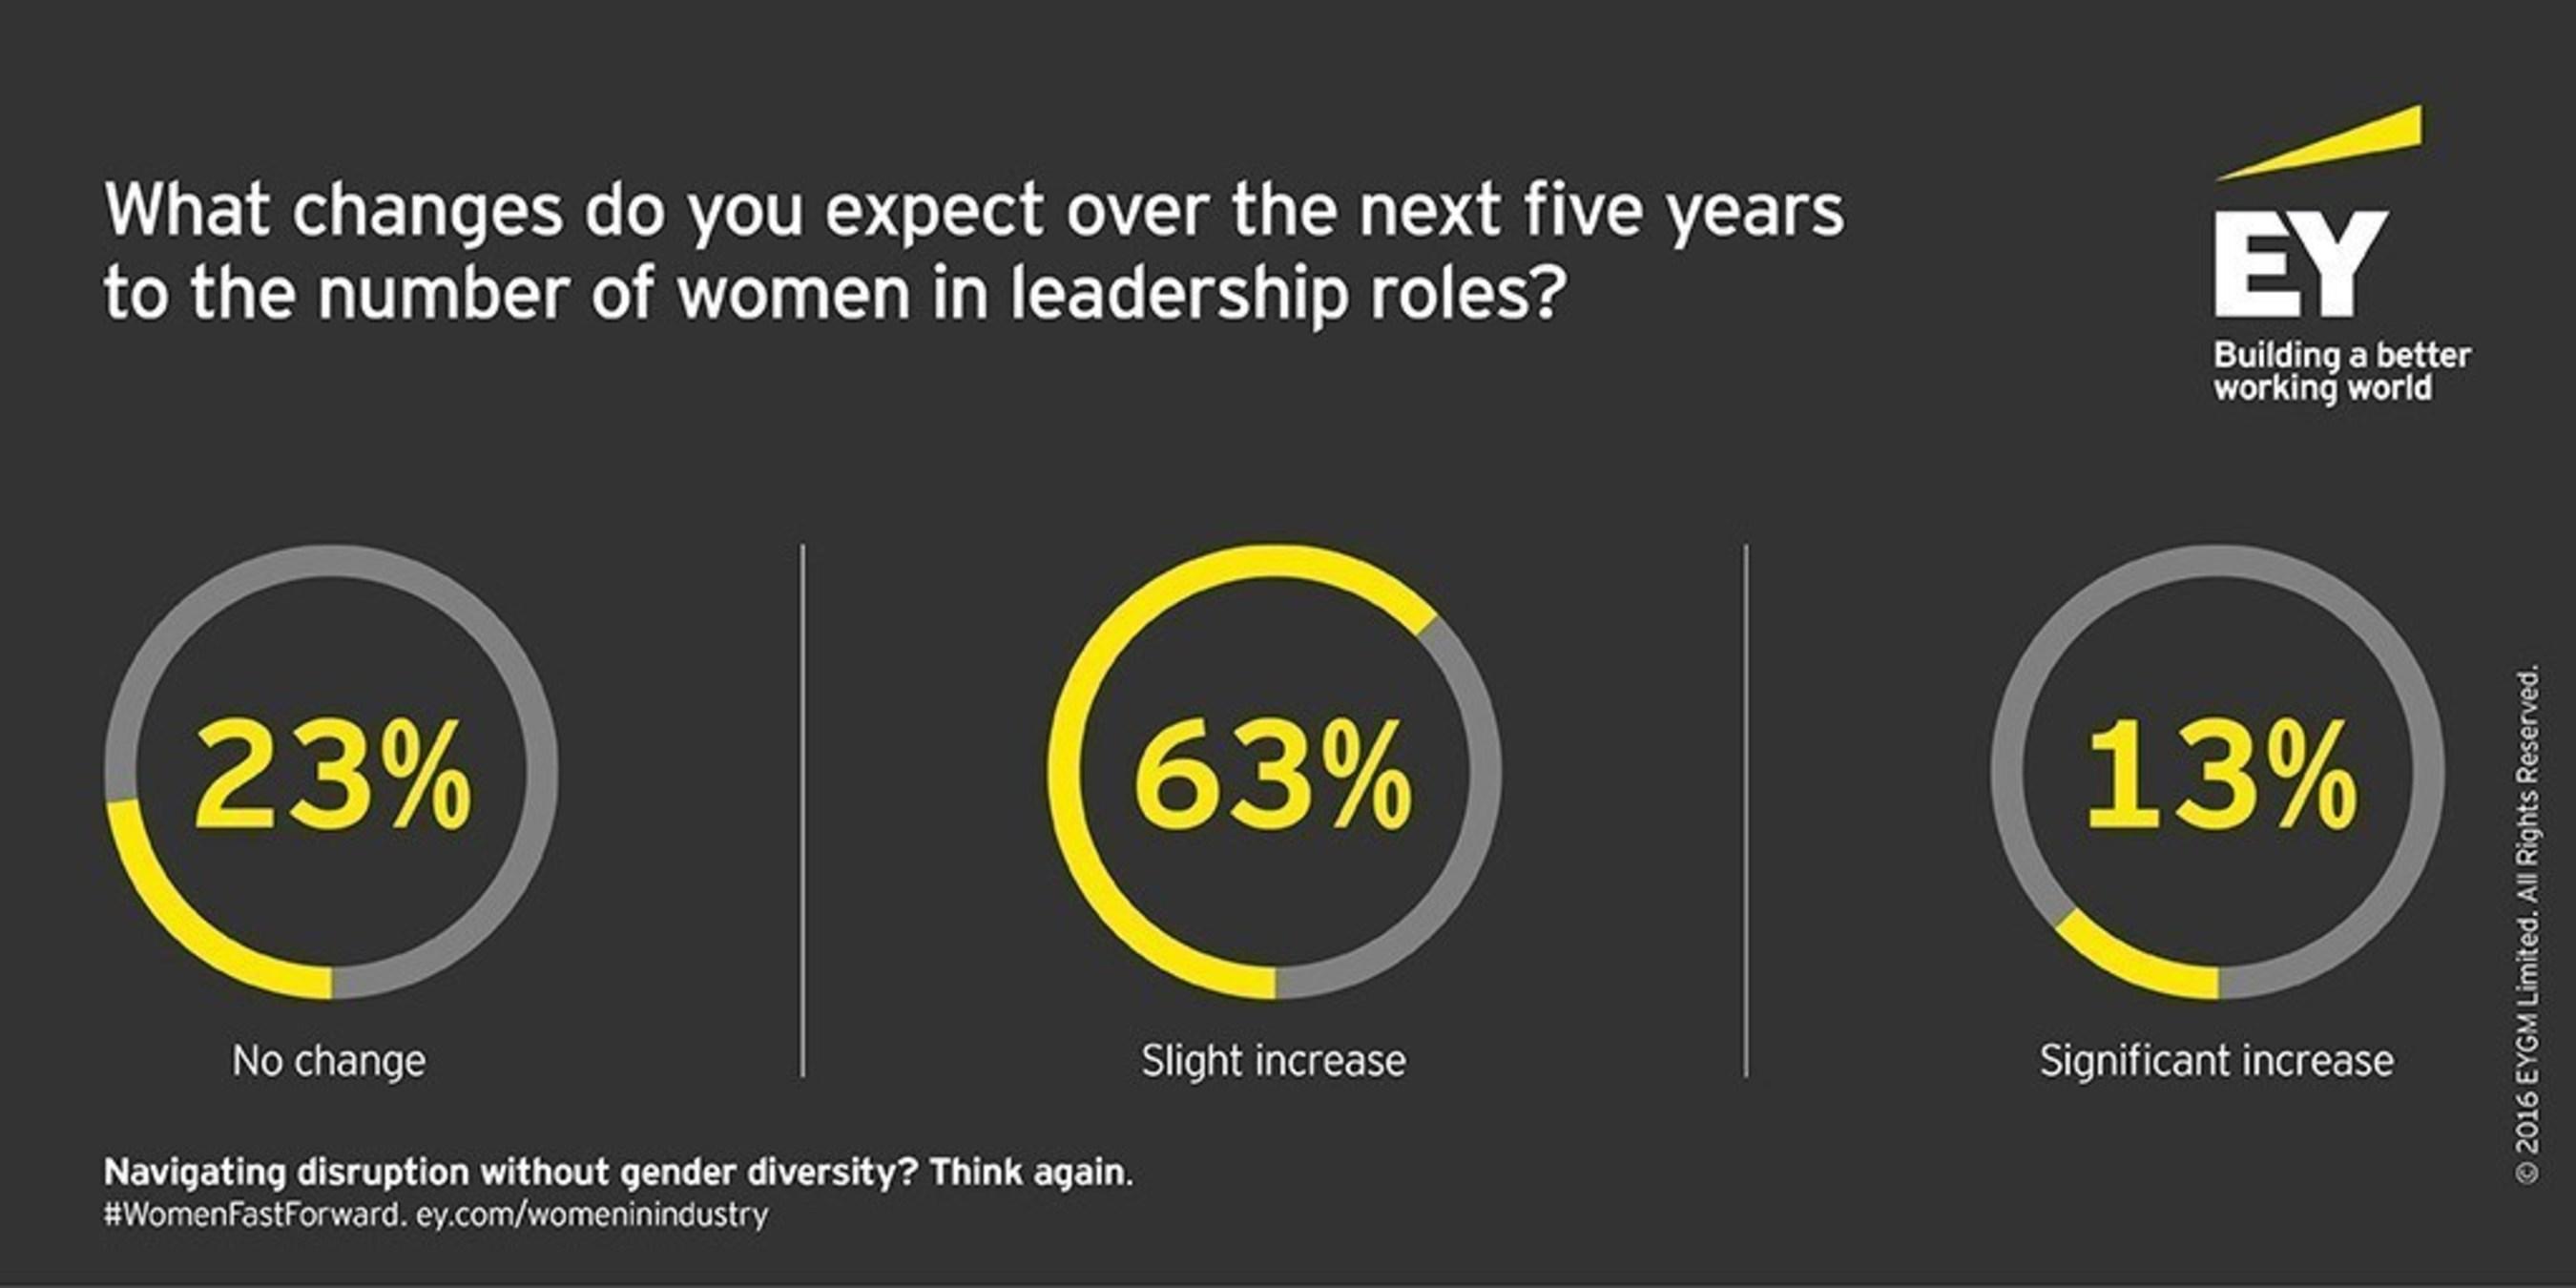 Navigating disruption without gender diversity? Think again.